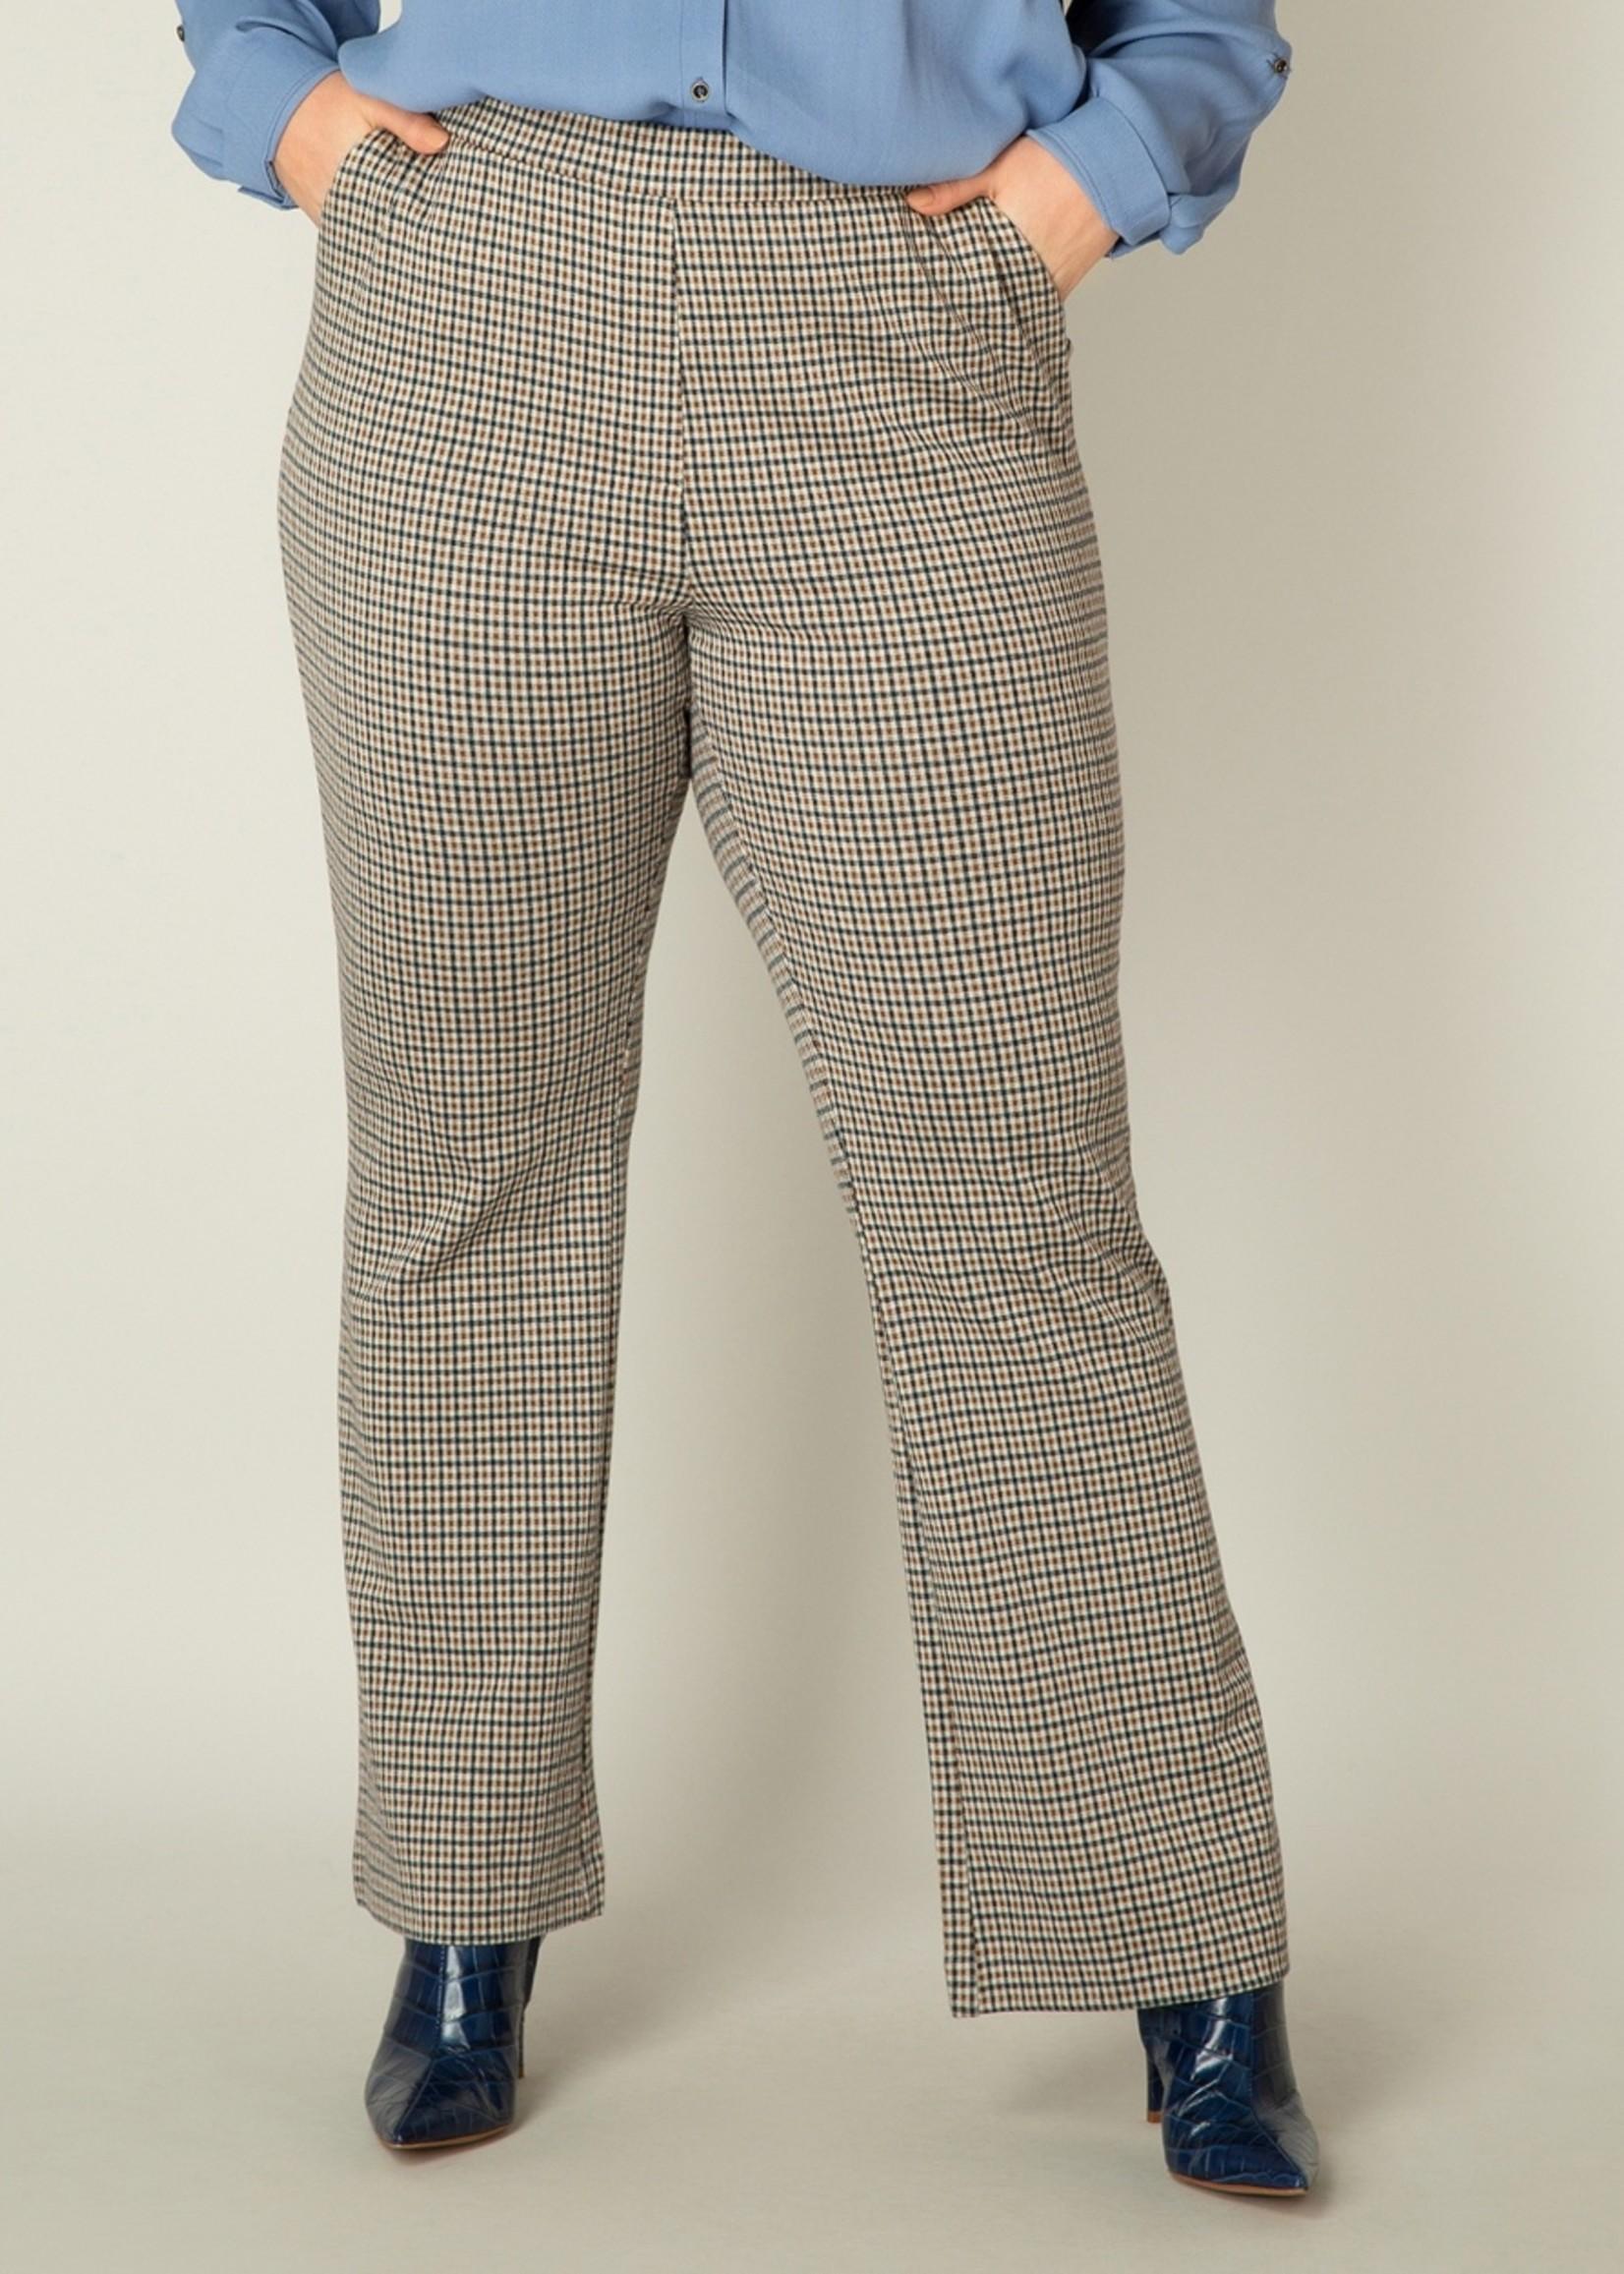 Yesta A002128 pantalon flared Veromme